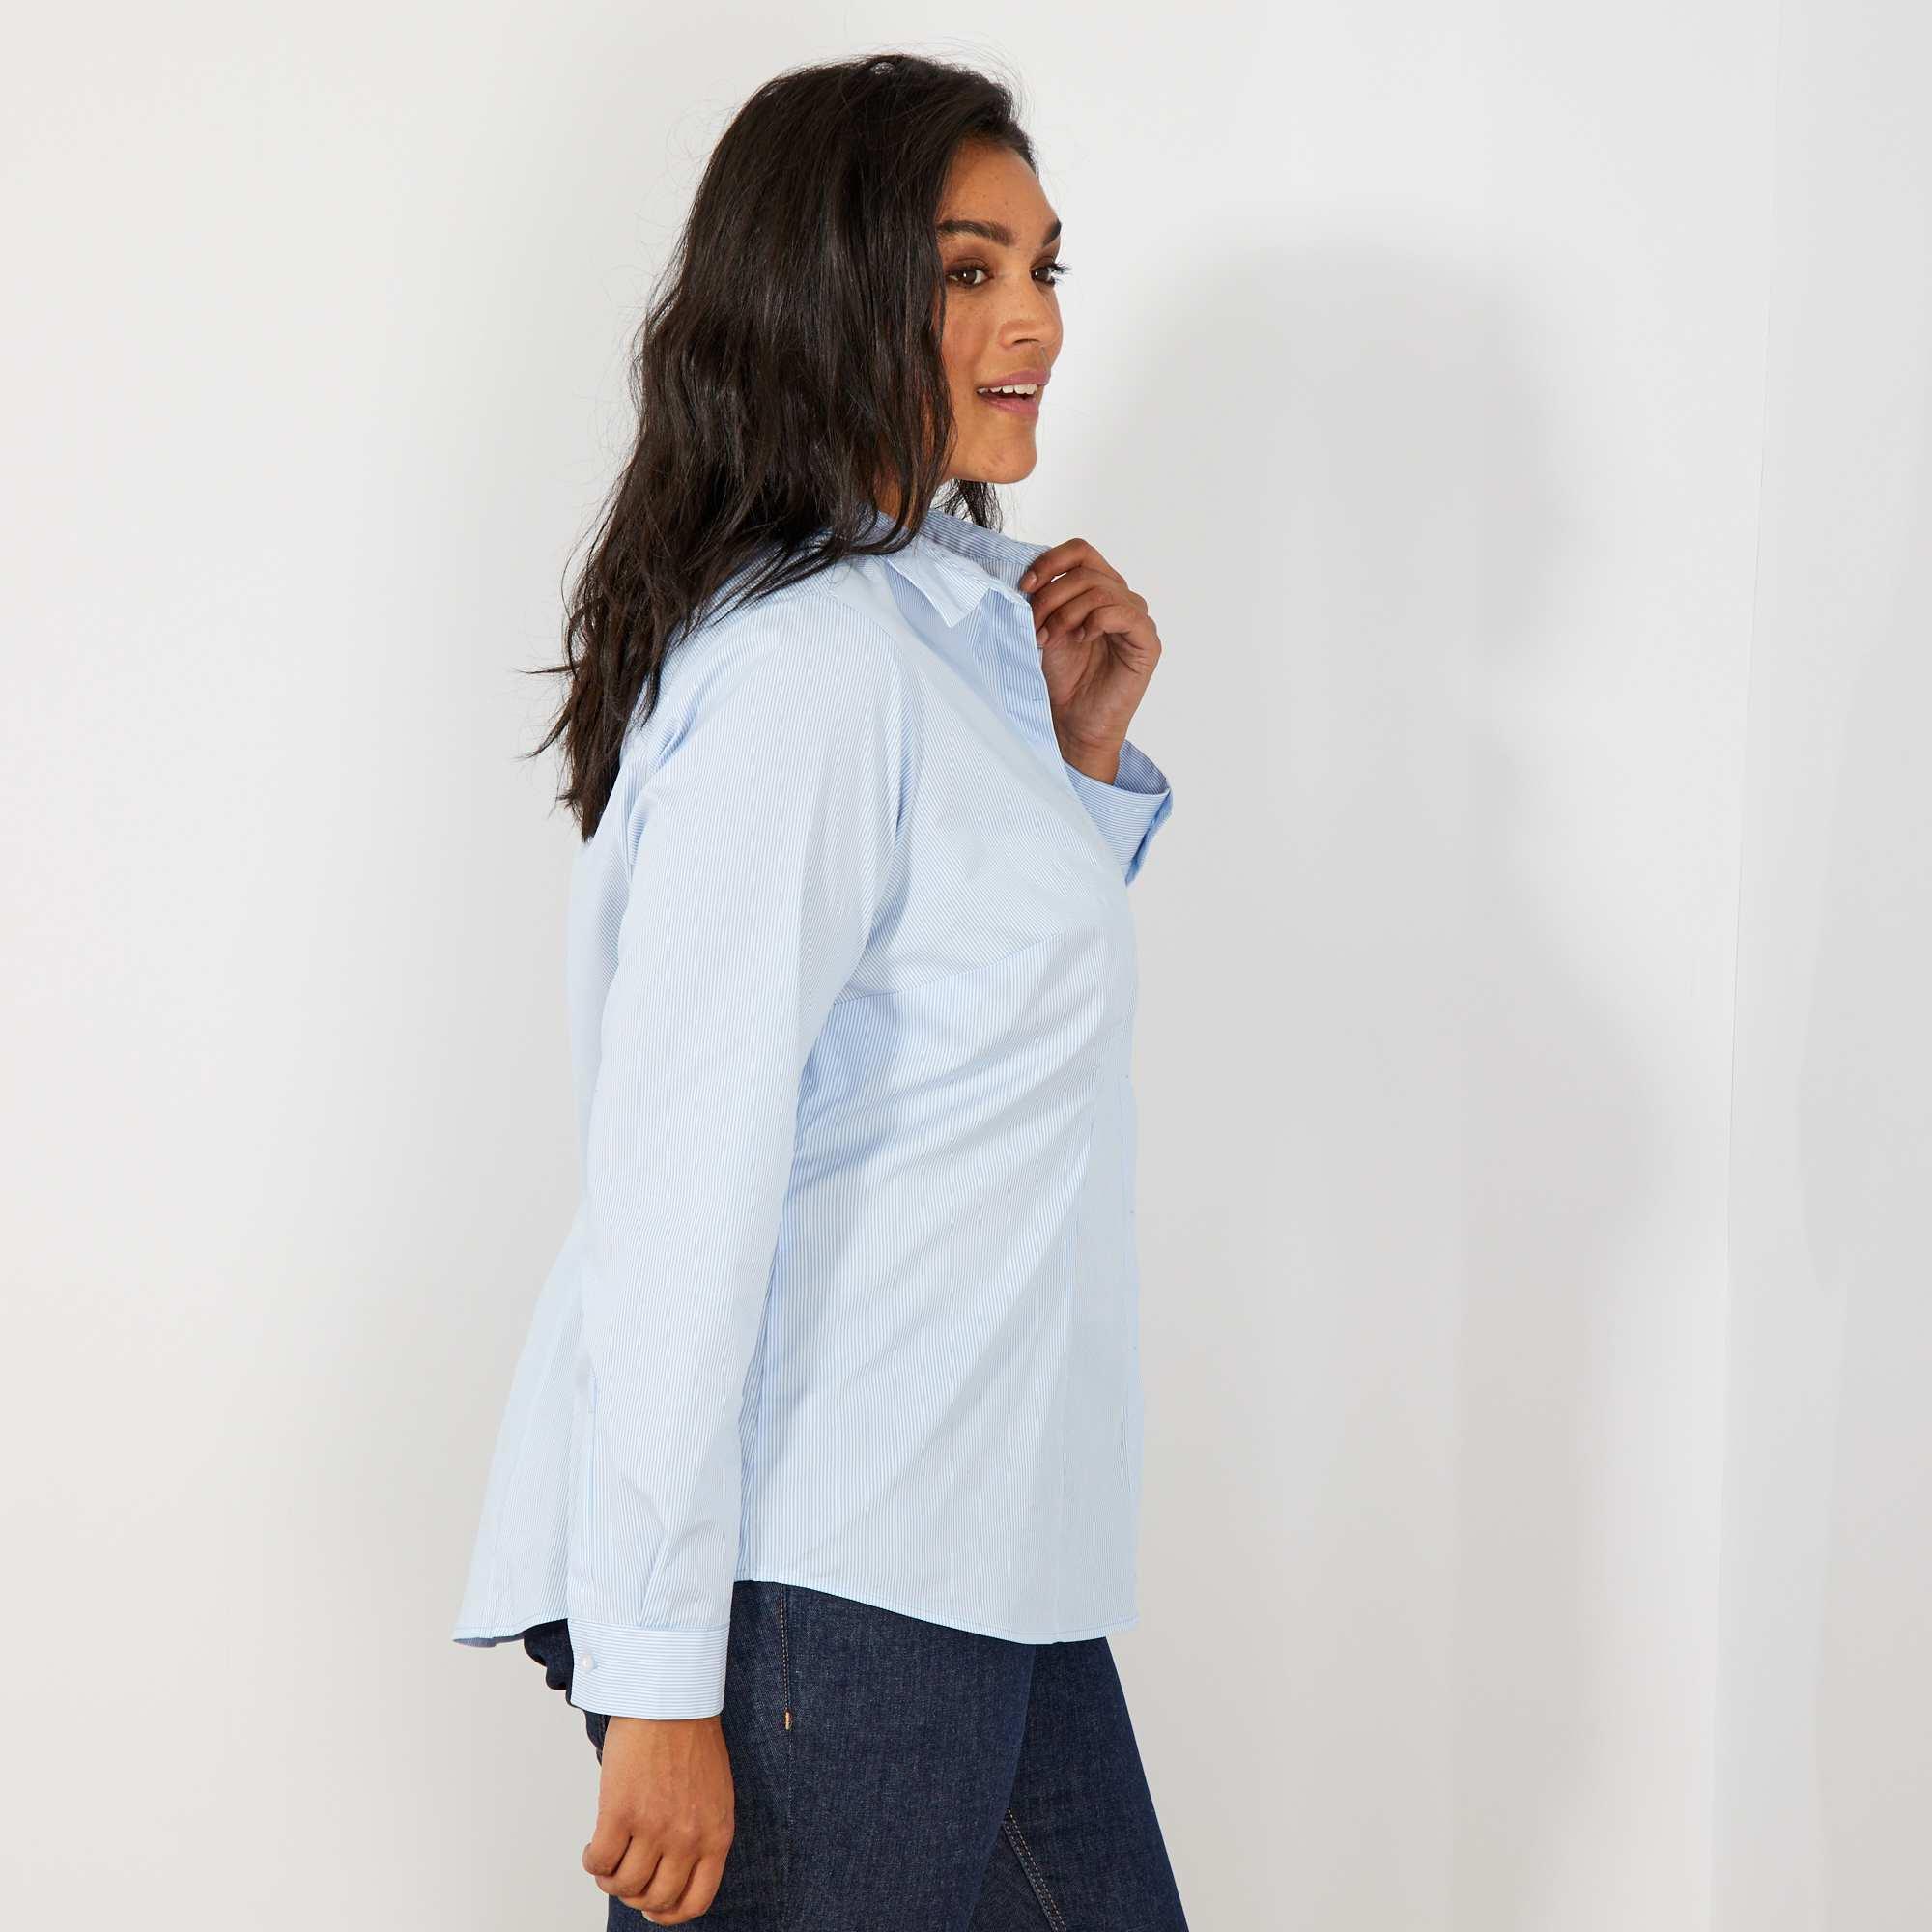 chemise en popeline stretch grande taille femme ray. Black Bedroom Furniture Sets. Home Design Ideas